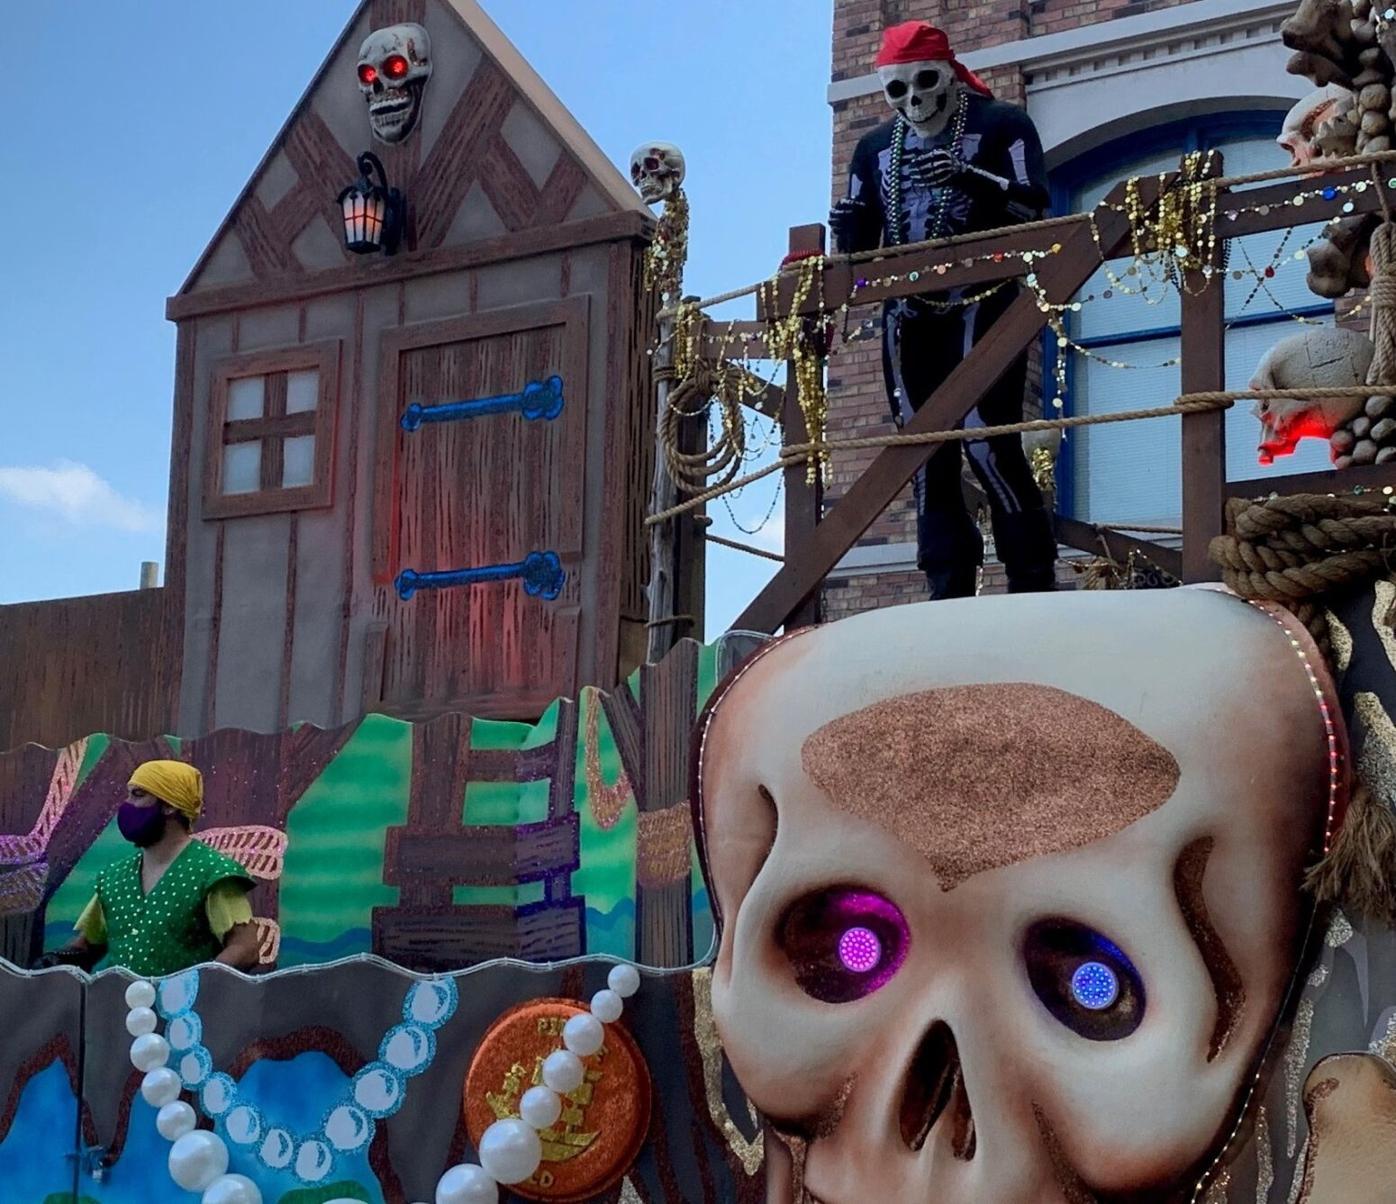 Floats but no parade